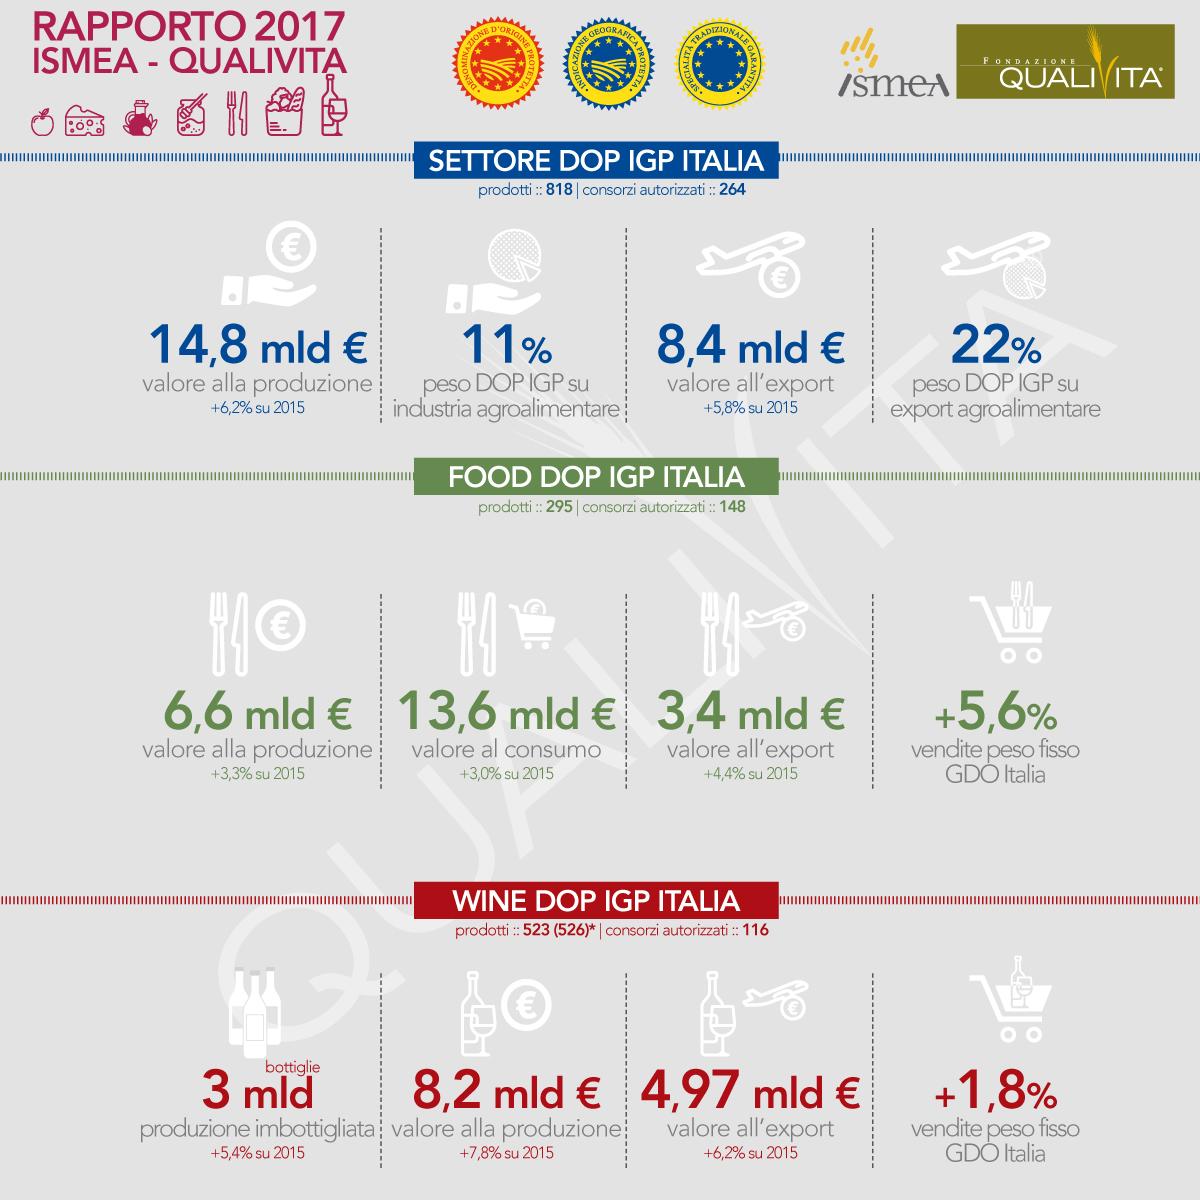 Infografica-Rapporto2017-OK-600x424